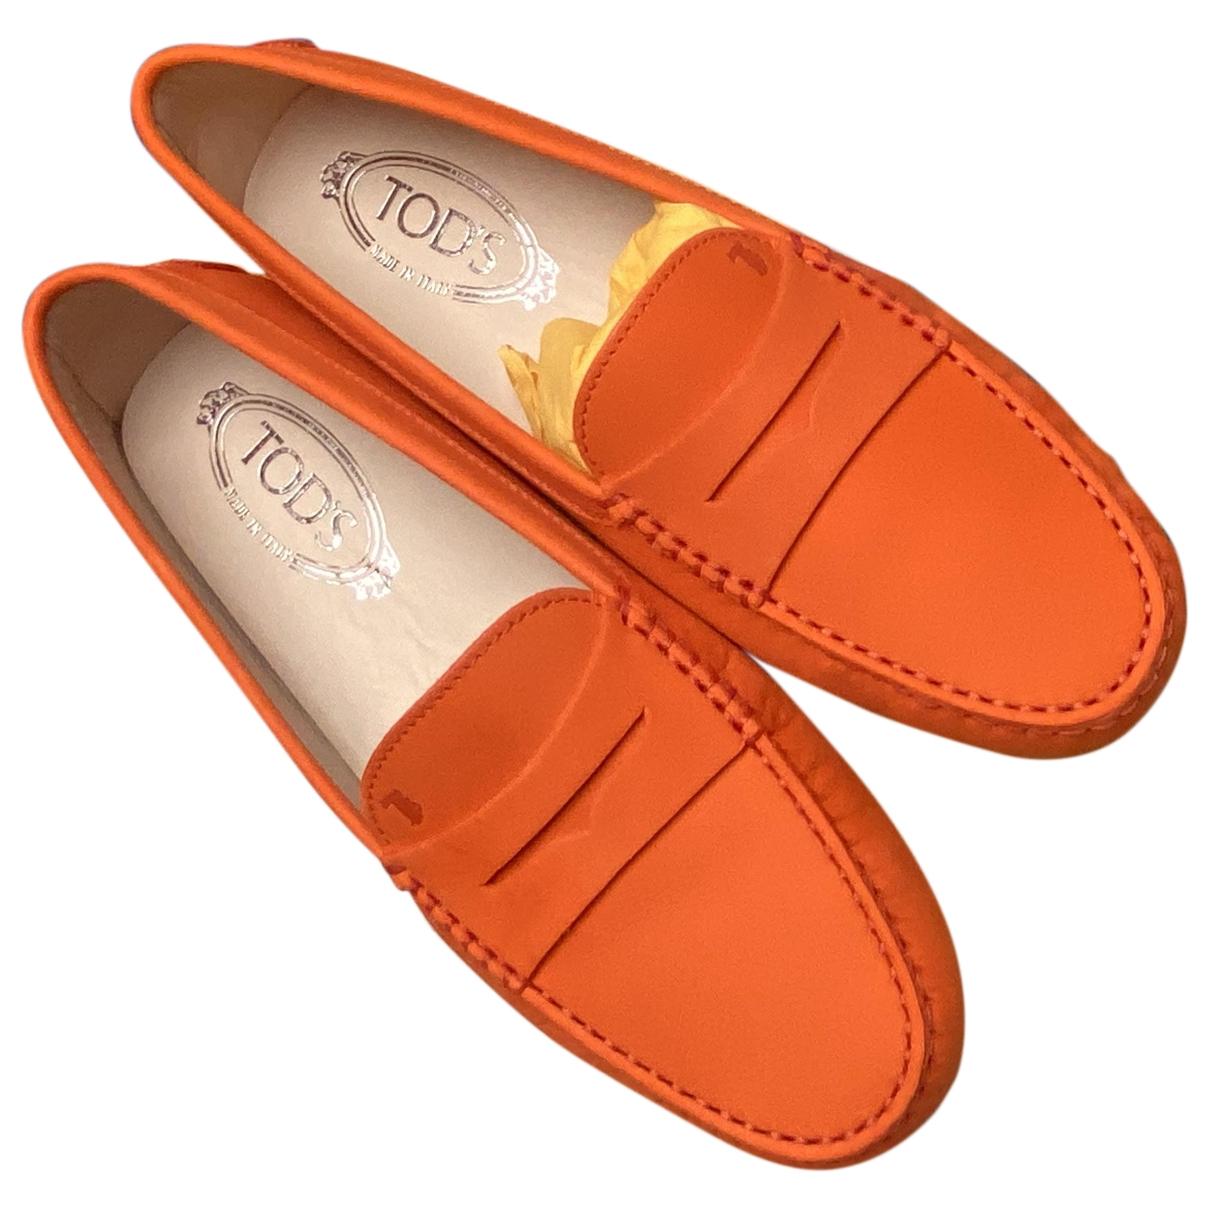 Tods - Mocassins Gommino pour femme en cuir - orange